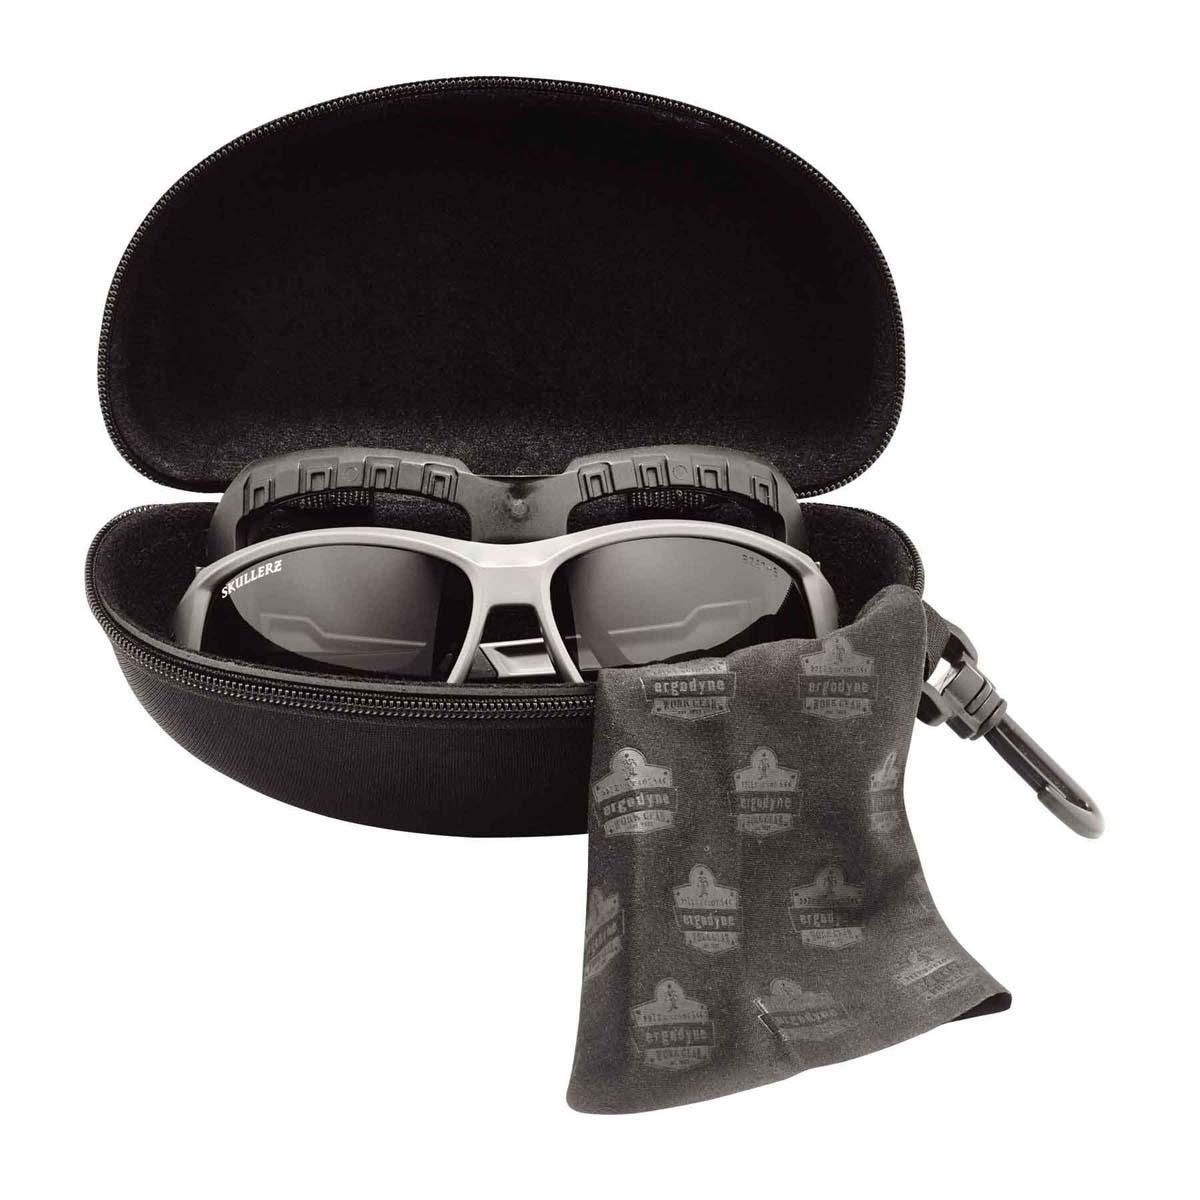 Ergodyne Skullerz 3222 Zipper Case w// Clip New,Free Shipping Black Case 19222